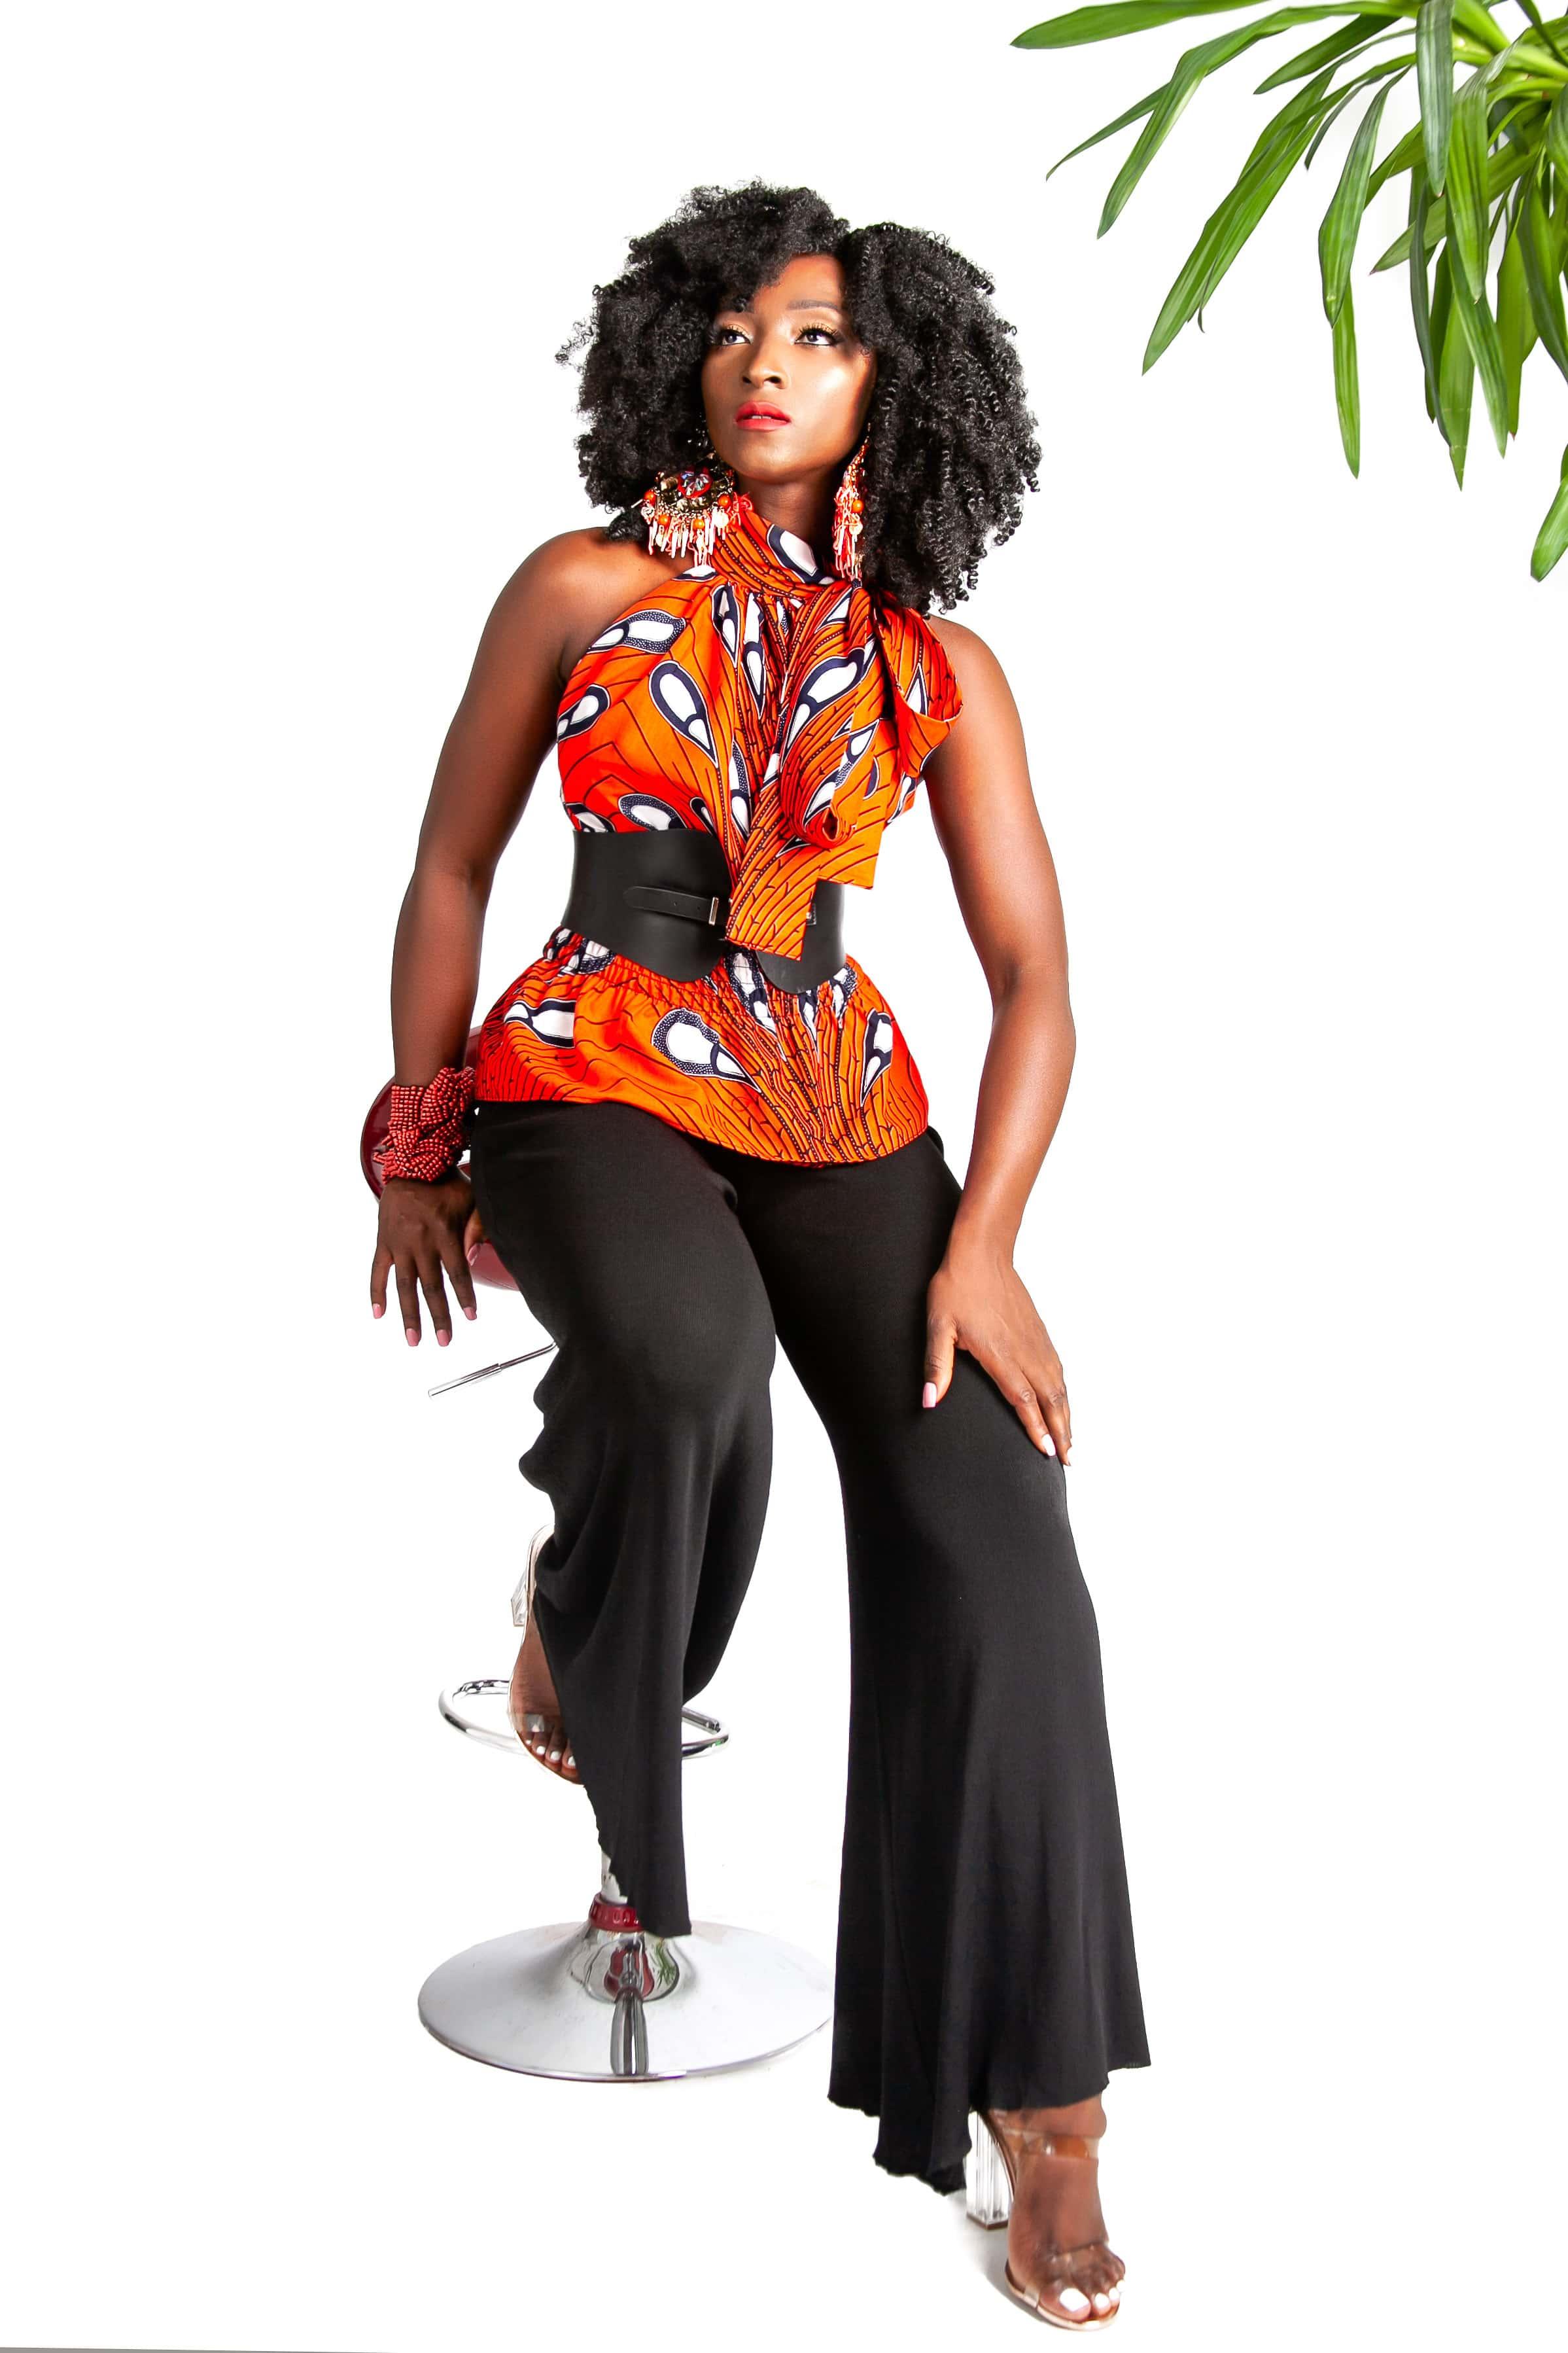 Lookbook for Fashion Brand Black Bamboo-1.jpg